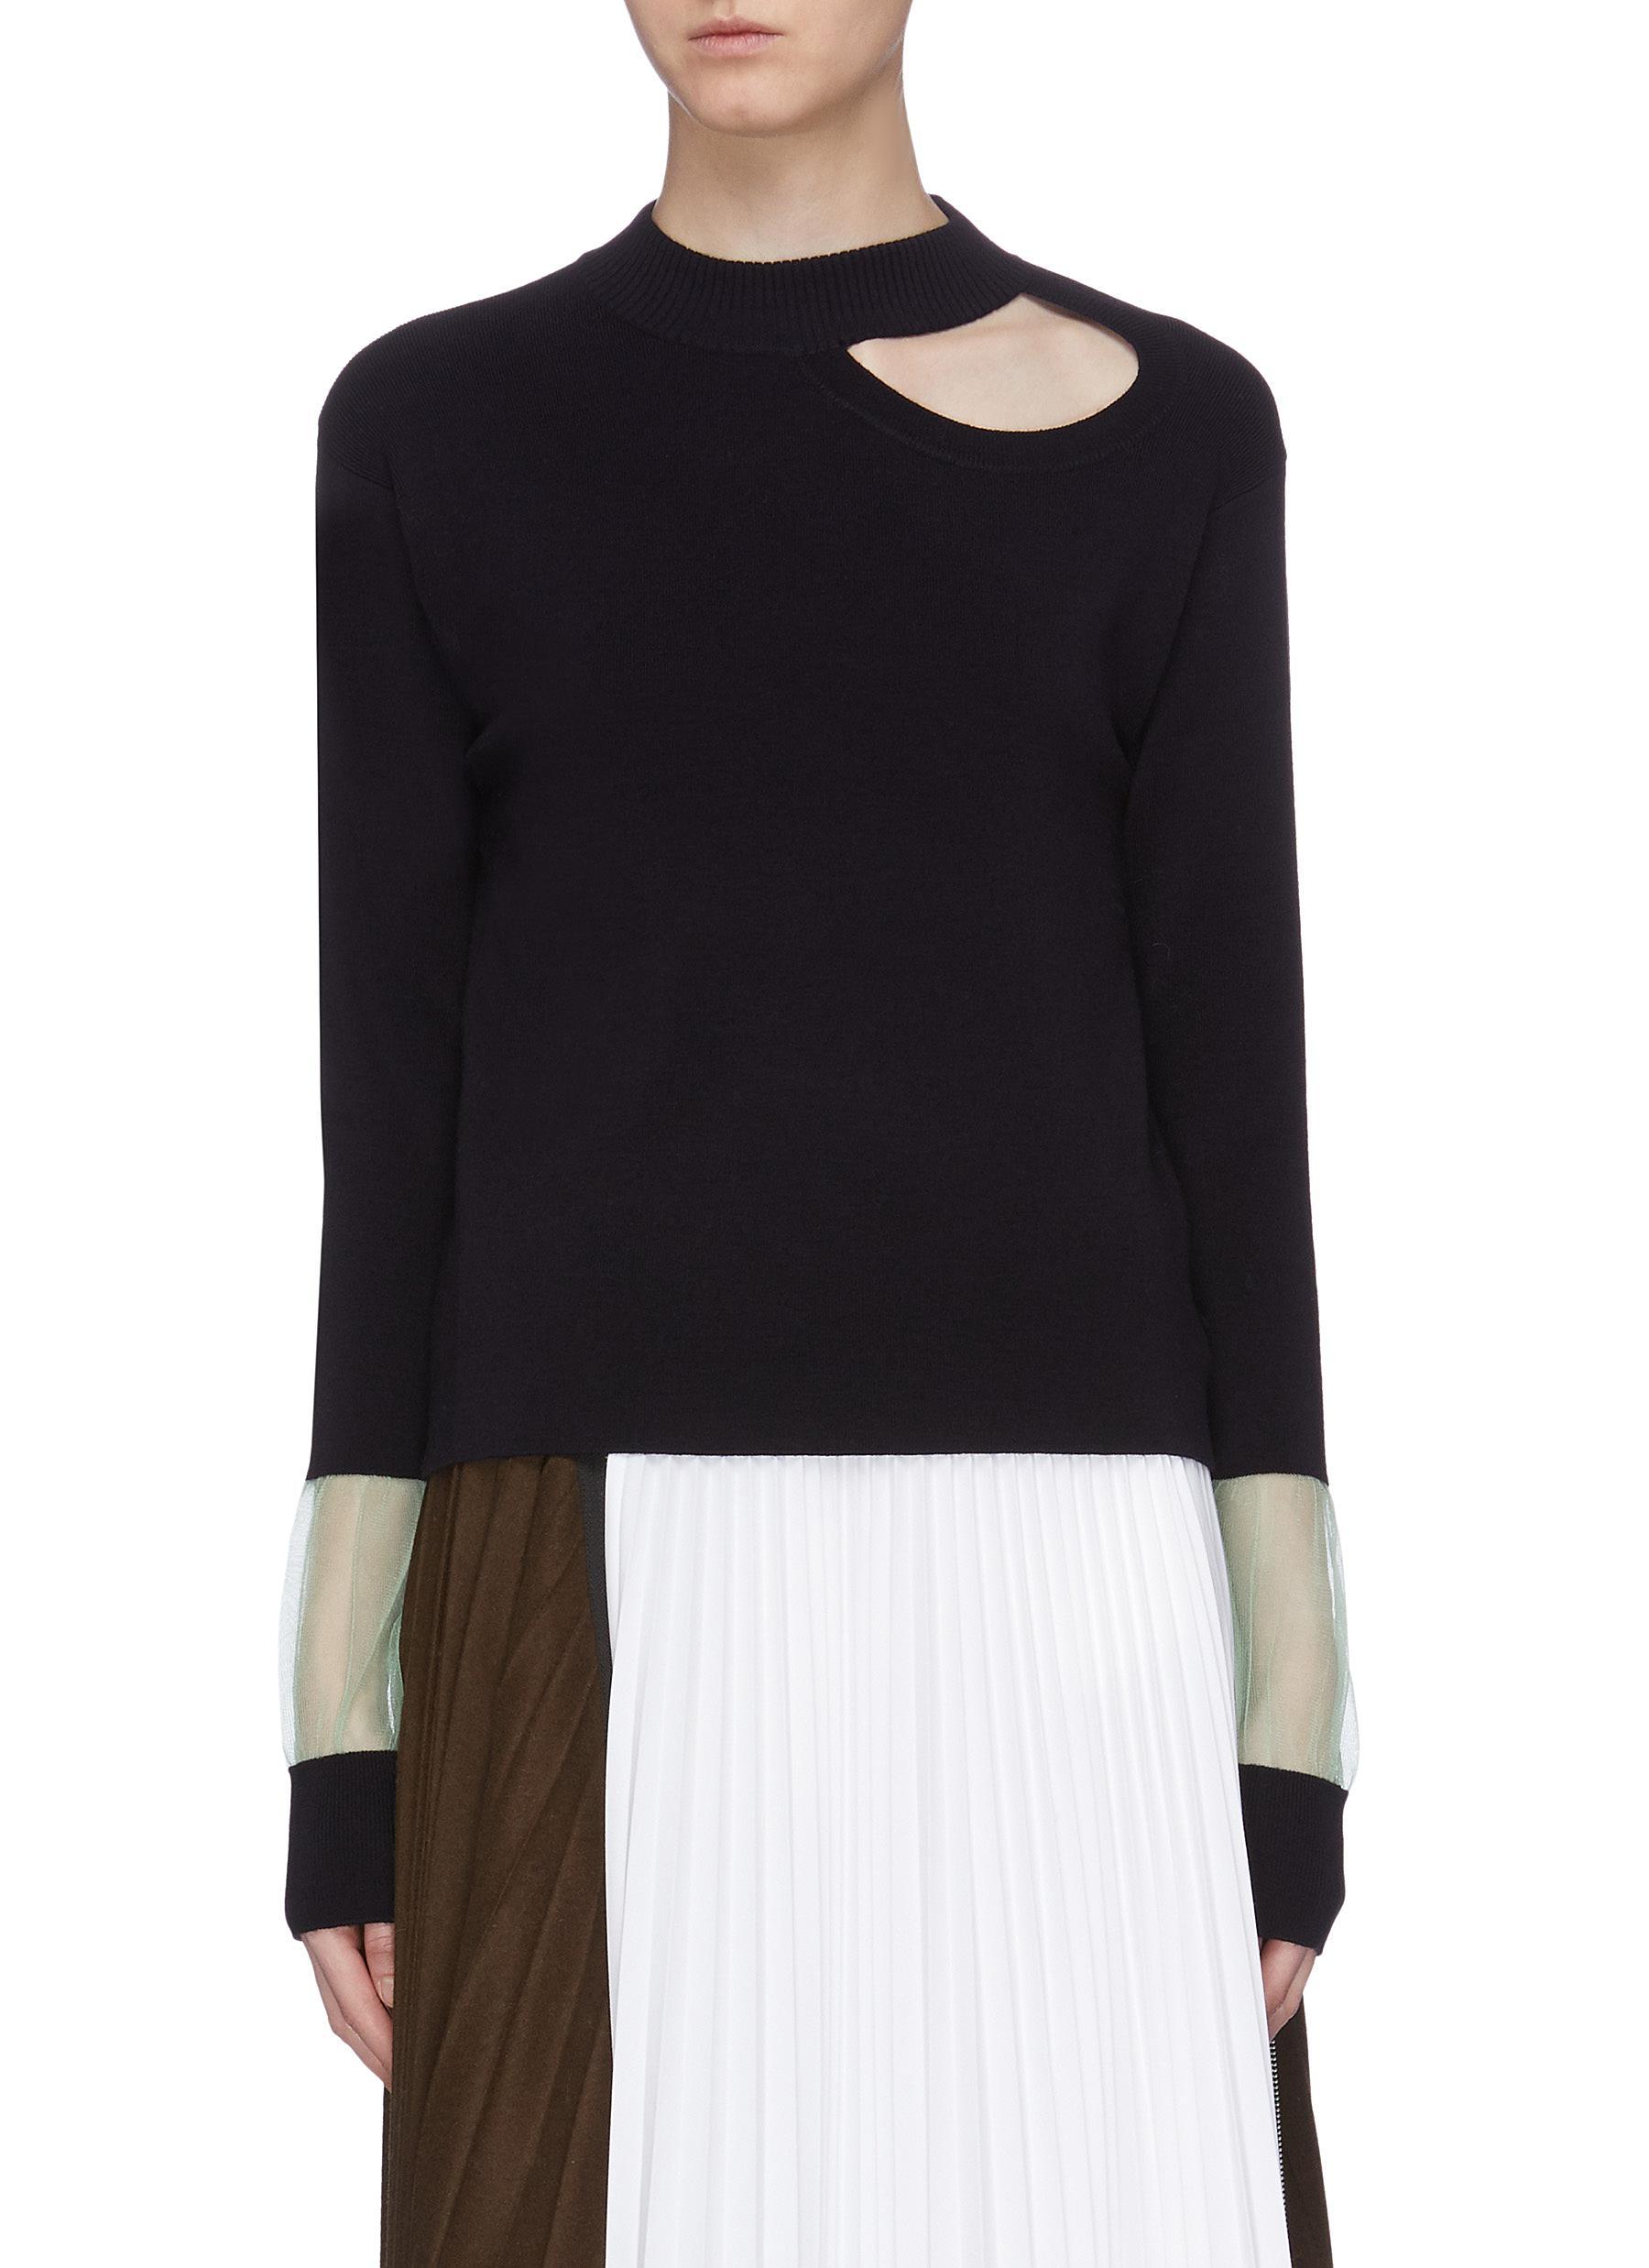 Cutout shoulder mesh cuff sweater by Short Sentence